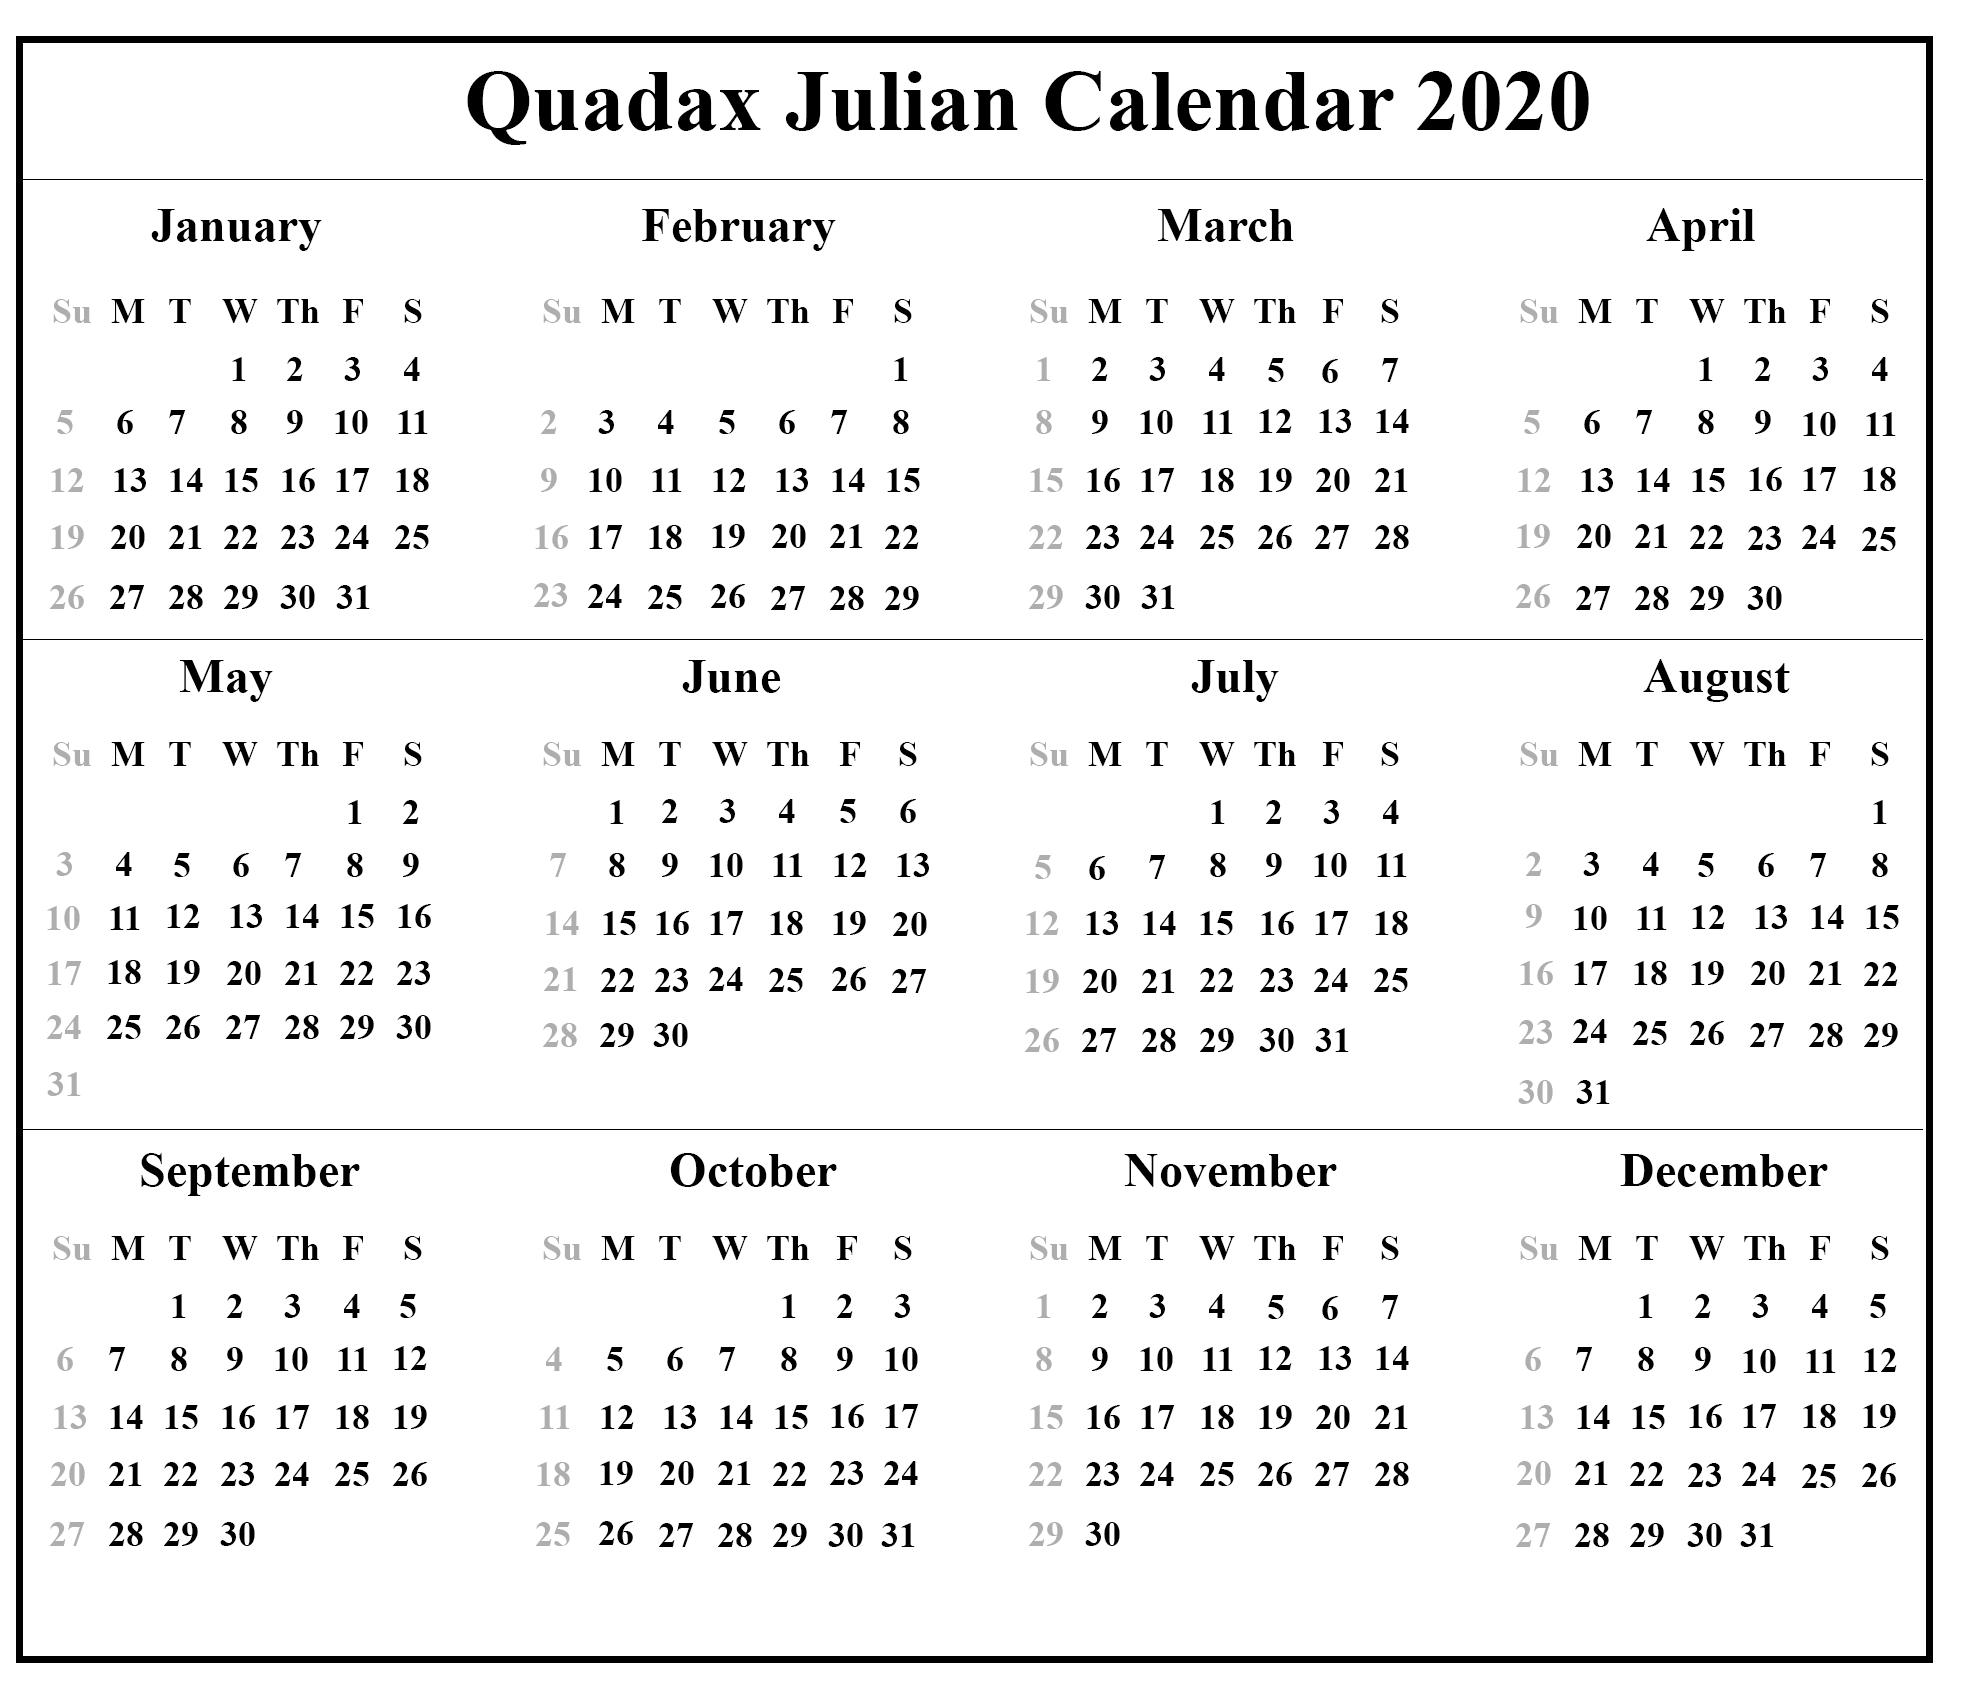 Free Printable Julian Calendar 2020 Template | Printable Calendar Diy regarding Year Calendar 2020 Special Days